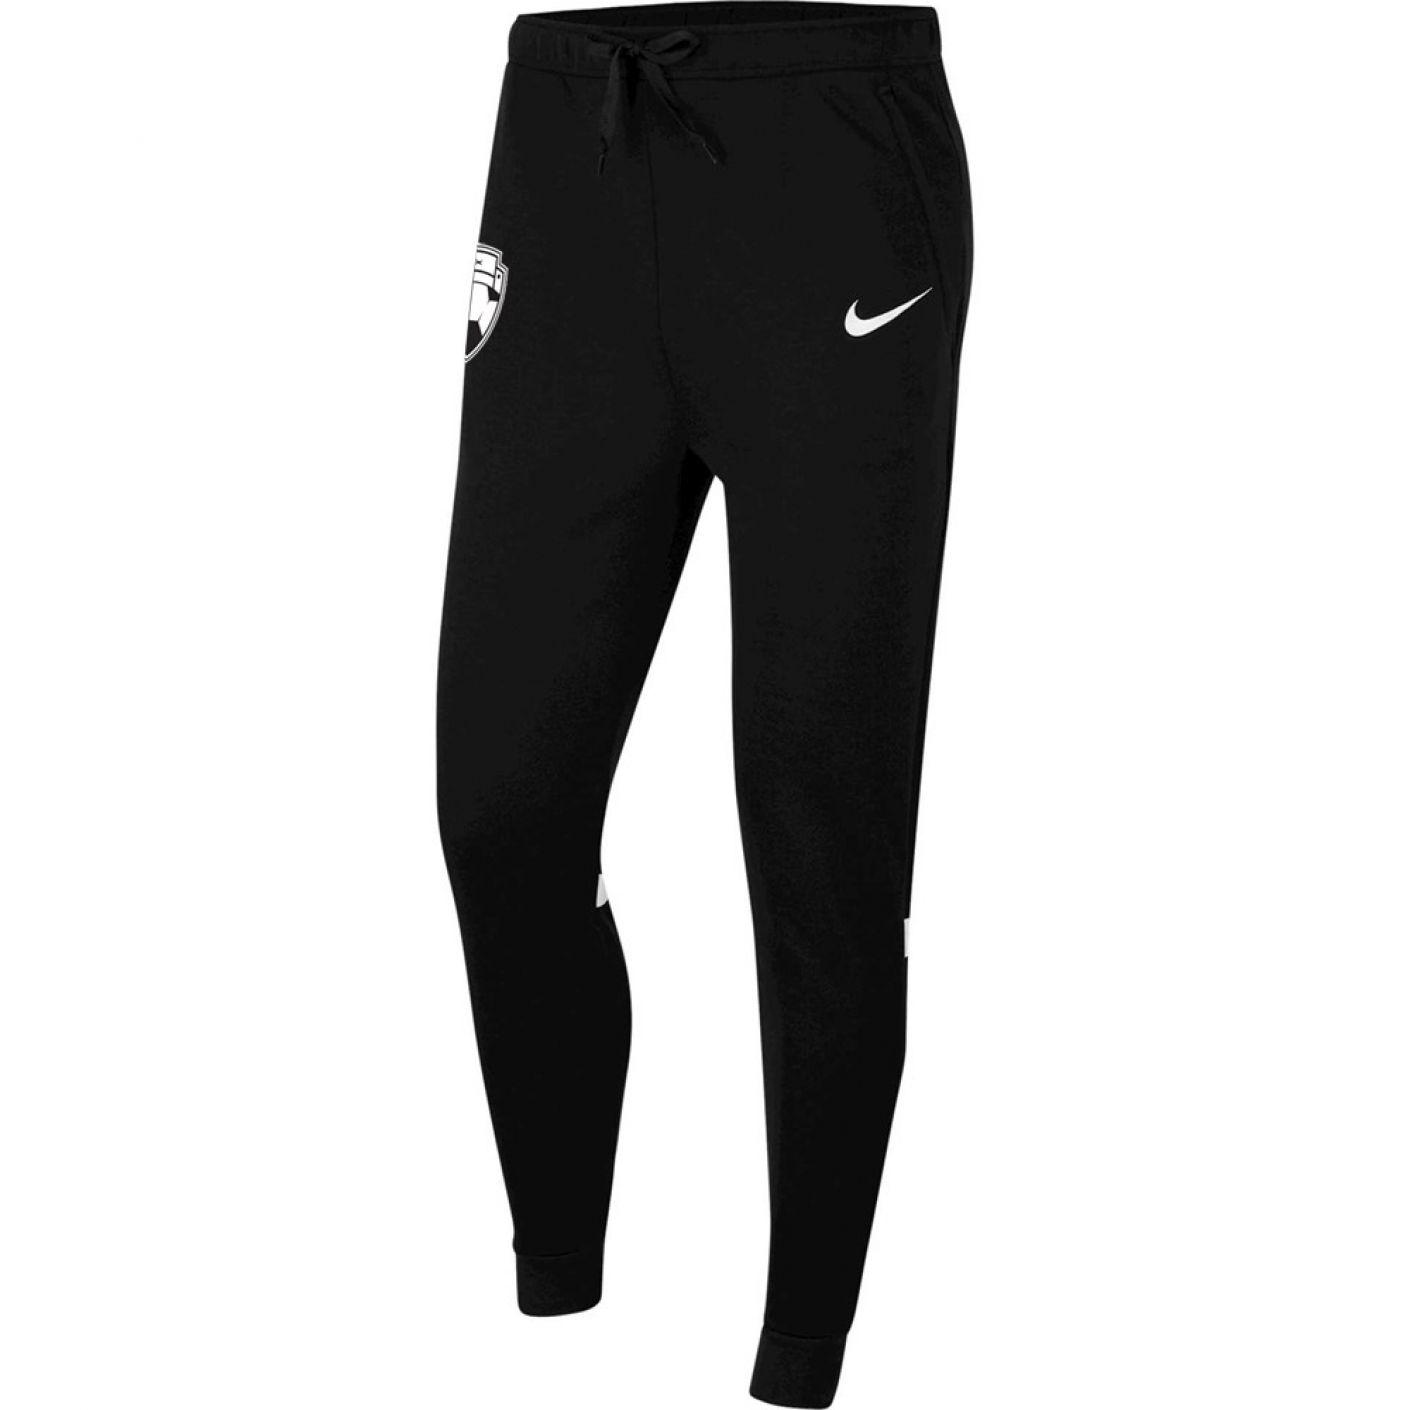 Nike Bankzitters Fleece Trainingsbroek Zwart Wit